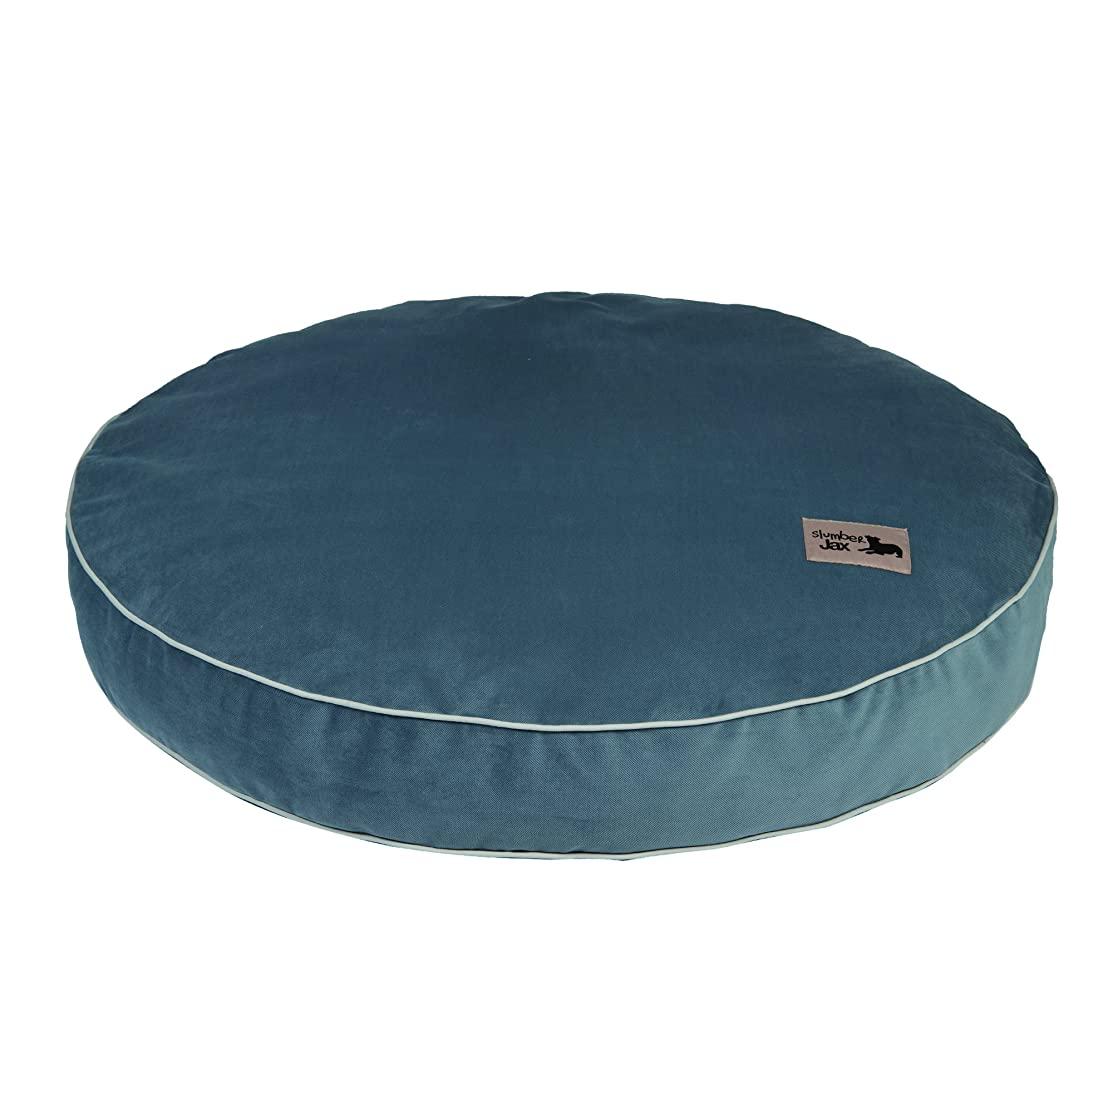 Slumber Jax Round Pillow Dog Bed